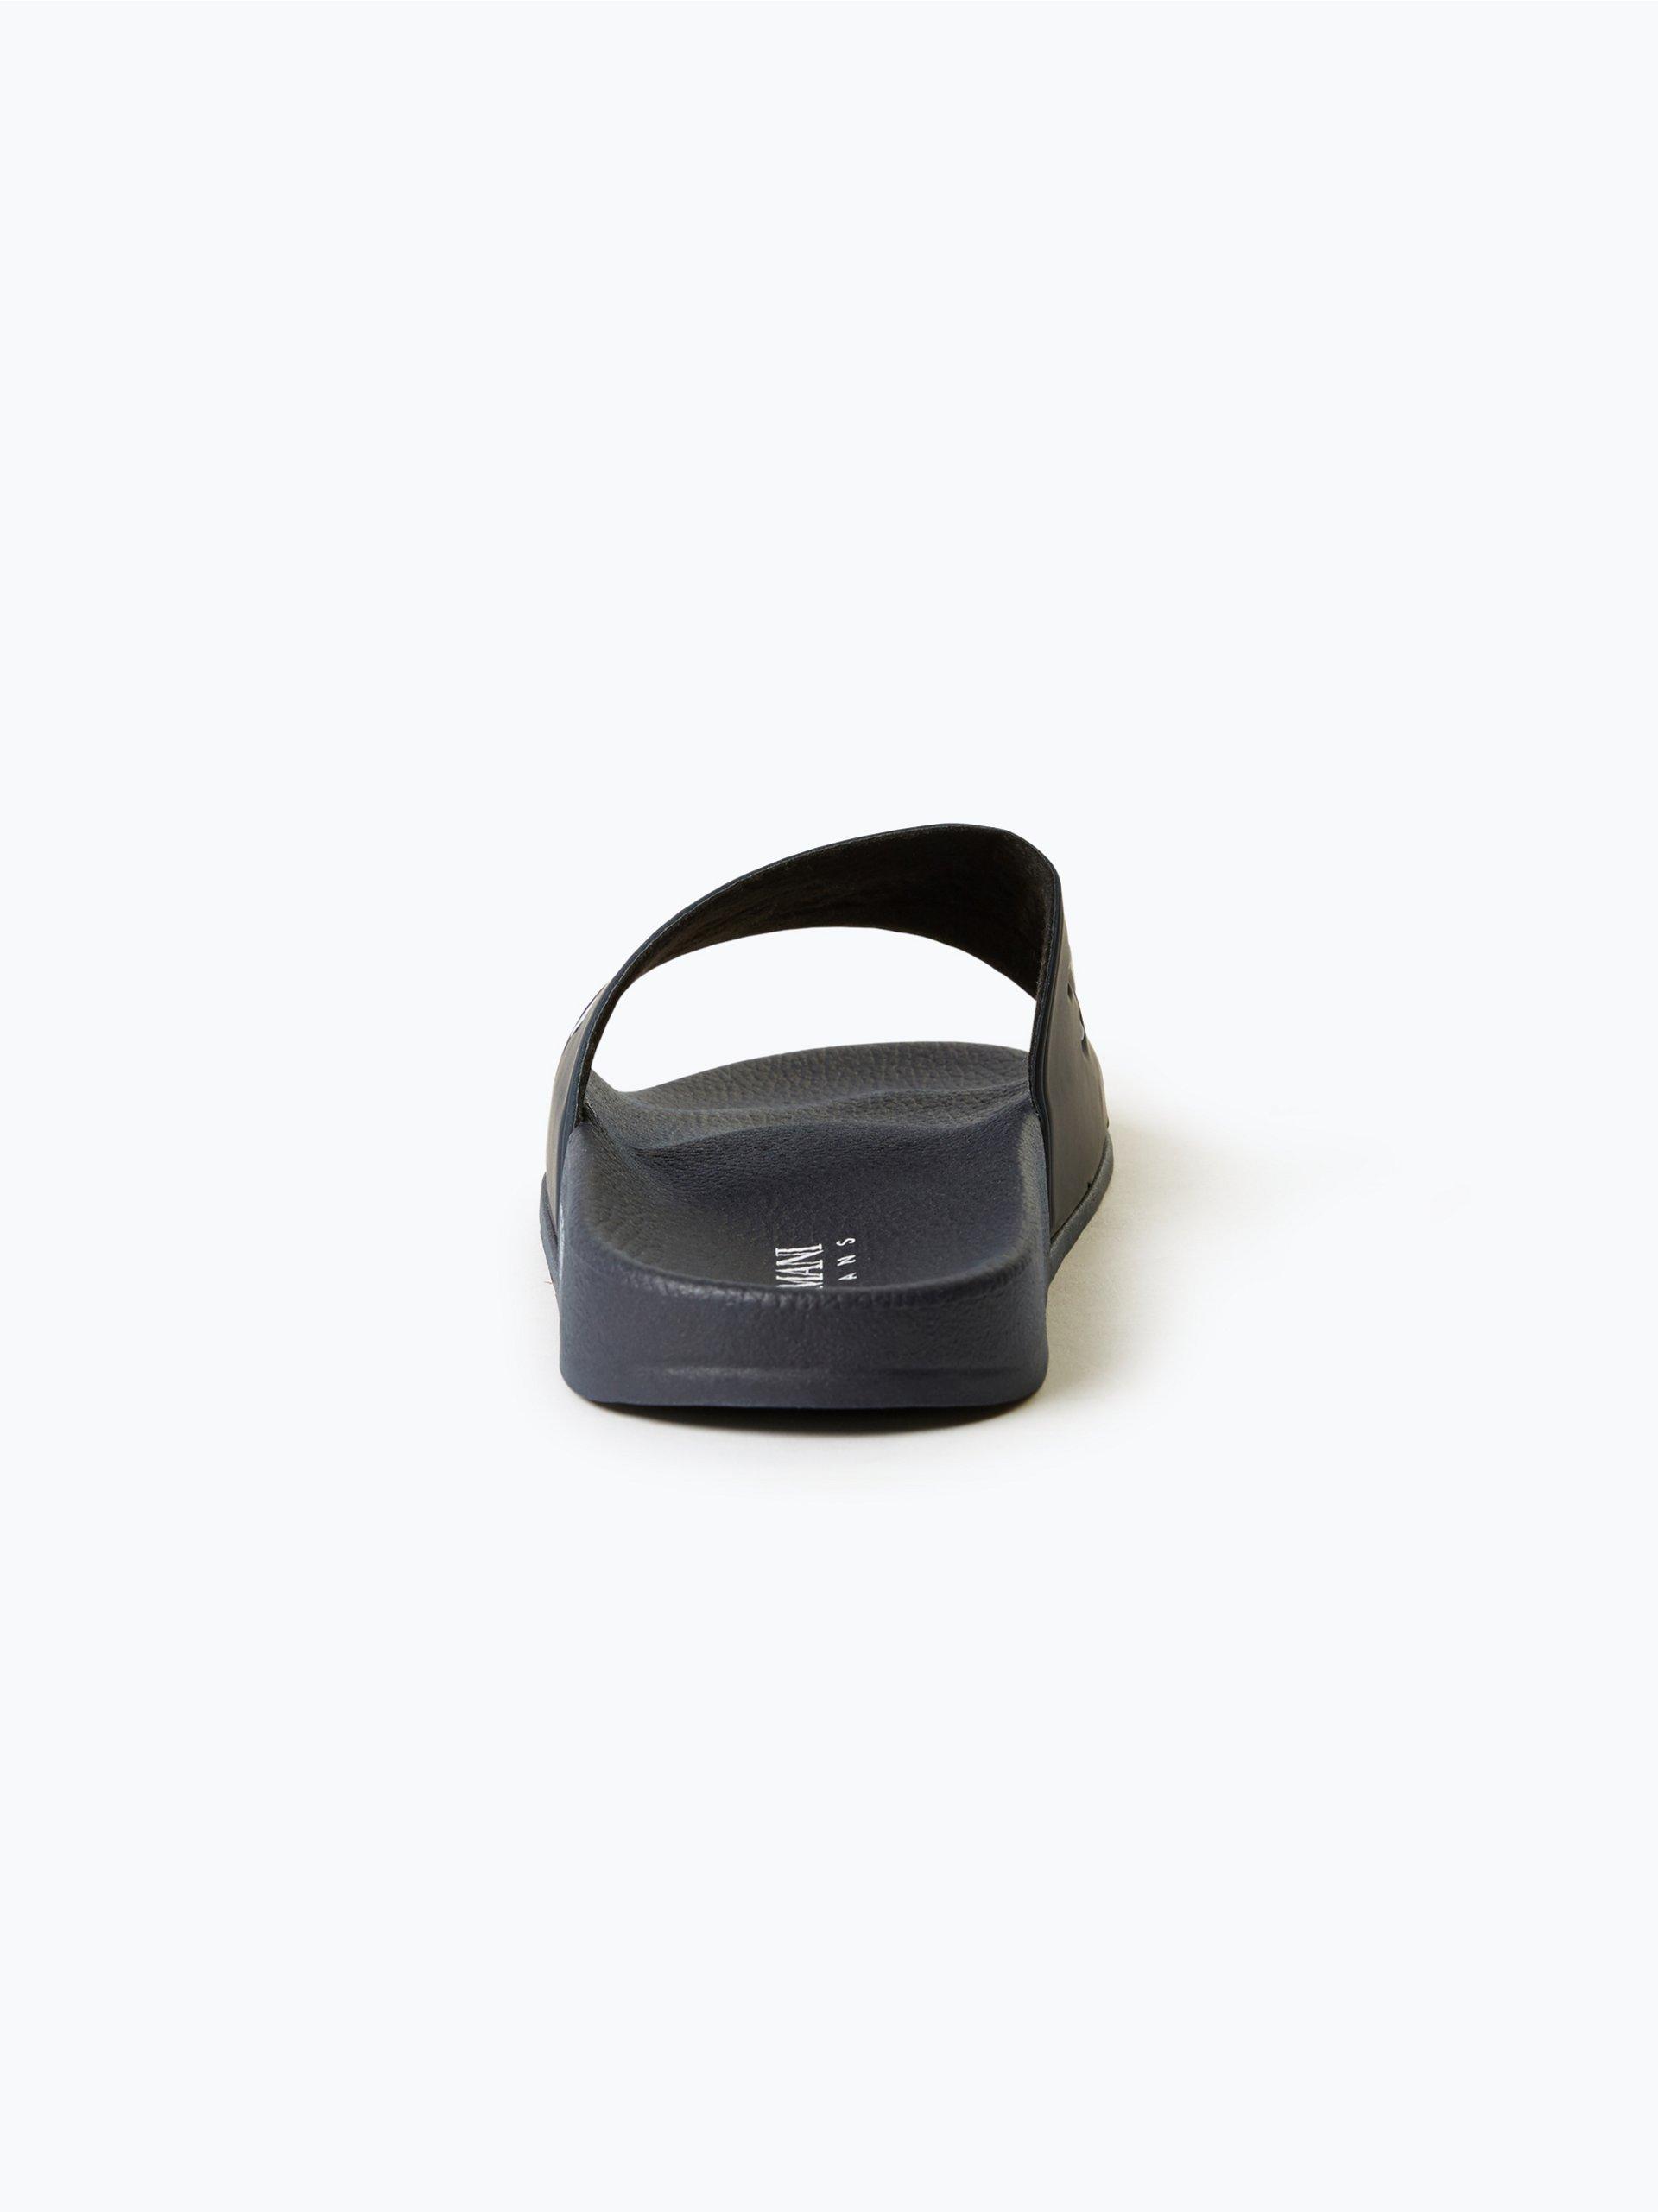 armani jeans herren badeschuhe marine uni online kaufen vangraaf com. Black Bedroom Furniture Sets. Home Design Ideas